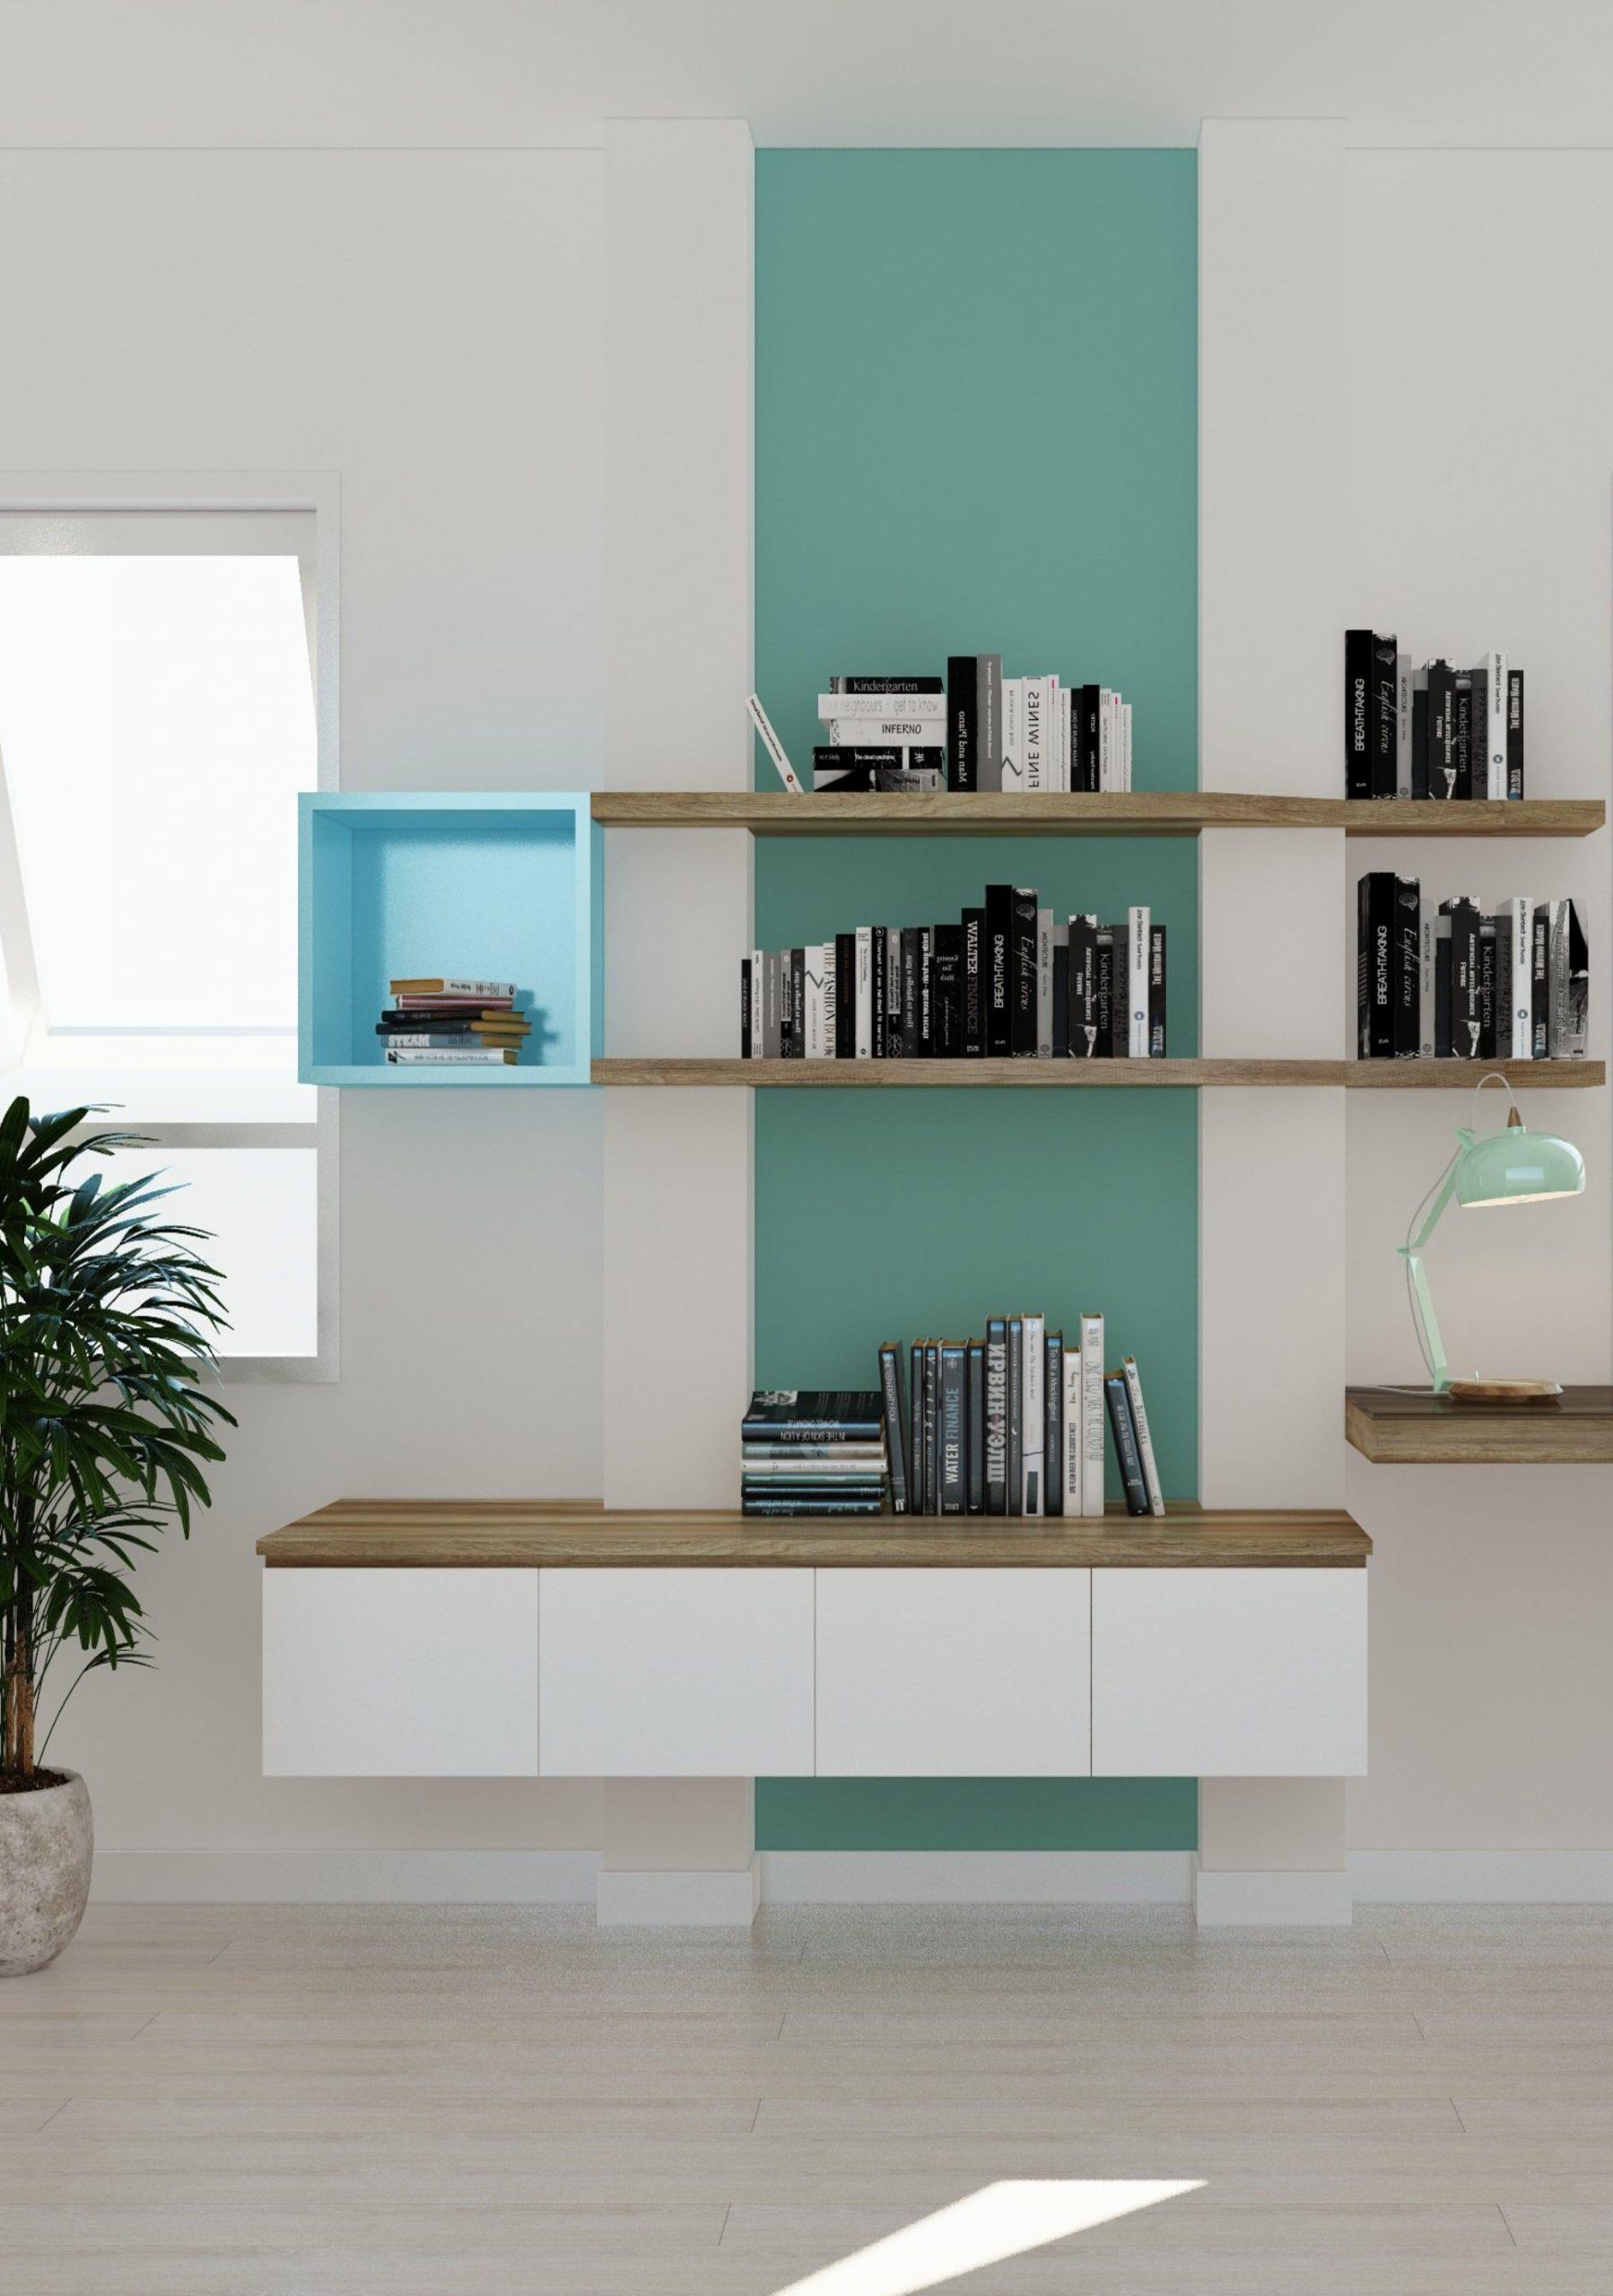 despacho1-virtual-home-staging-neutral-decor-5